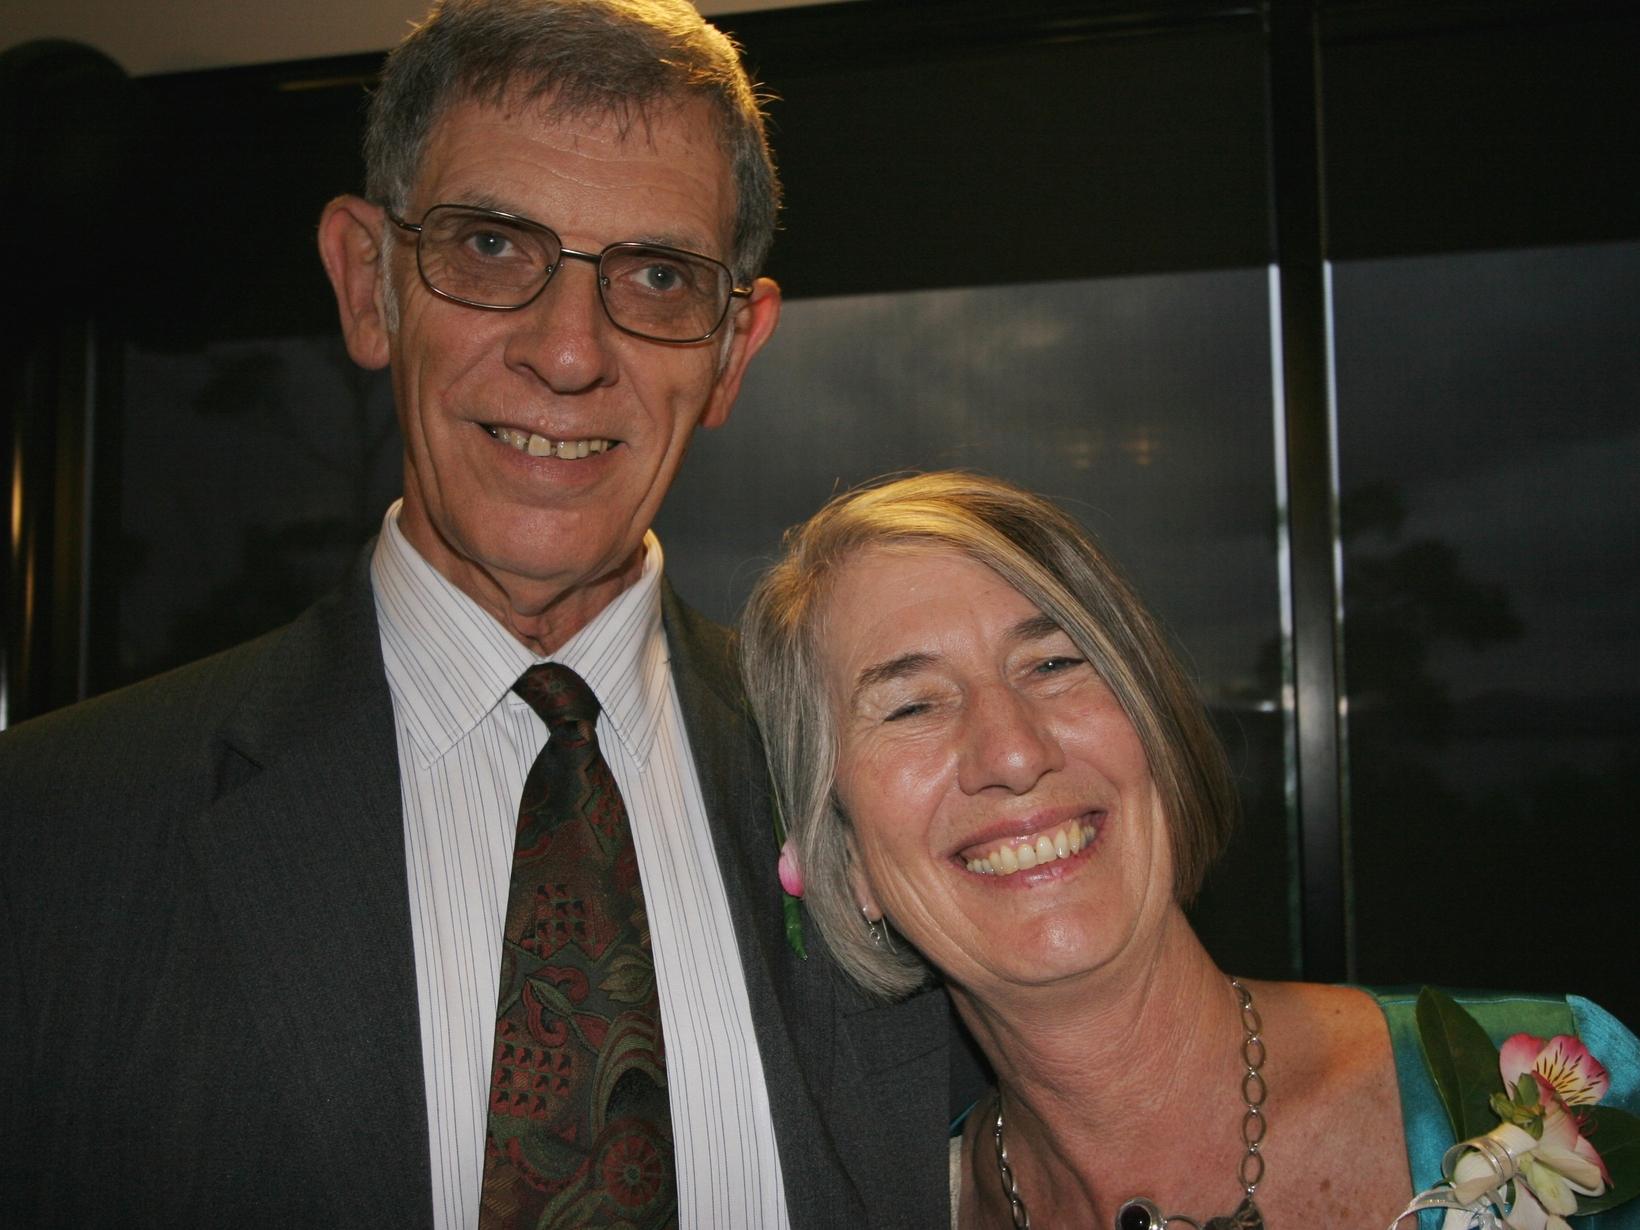 Jennifer & Robert from Sydney, New South Wales, Australia